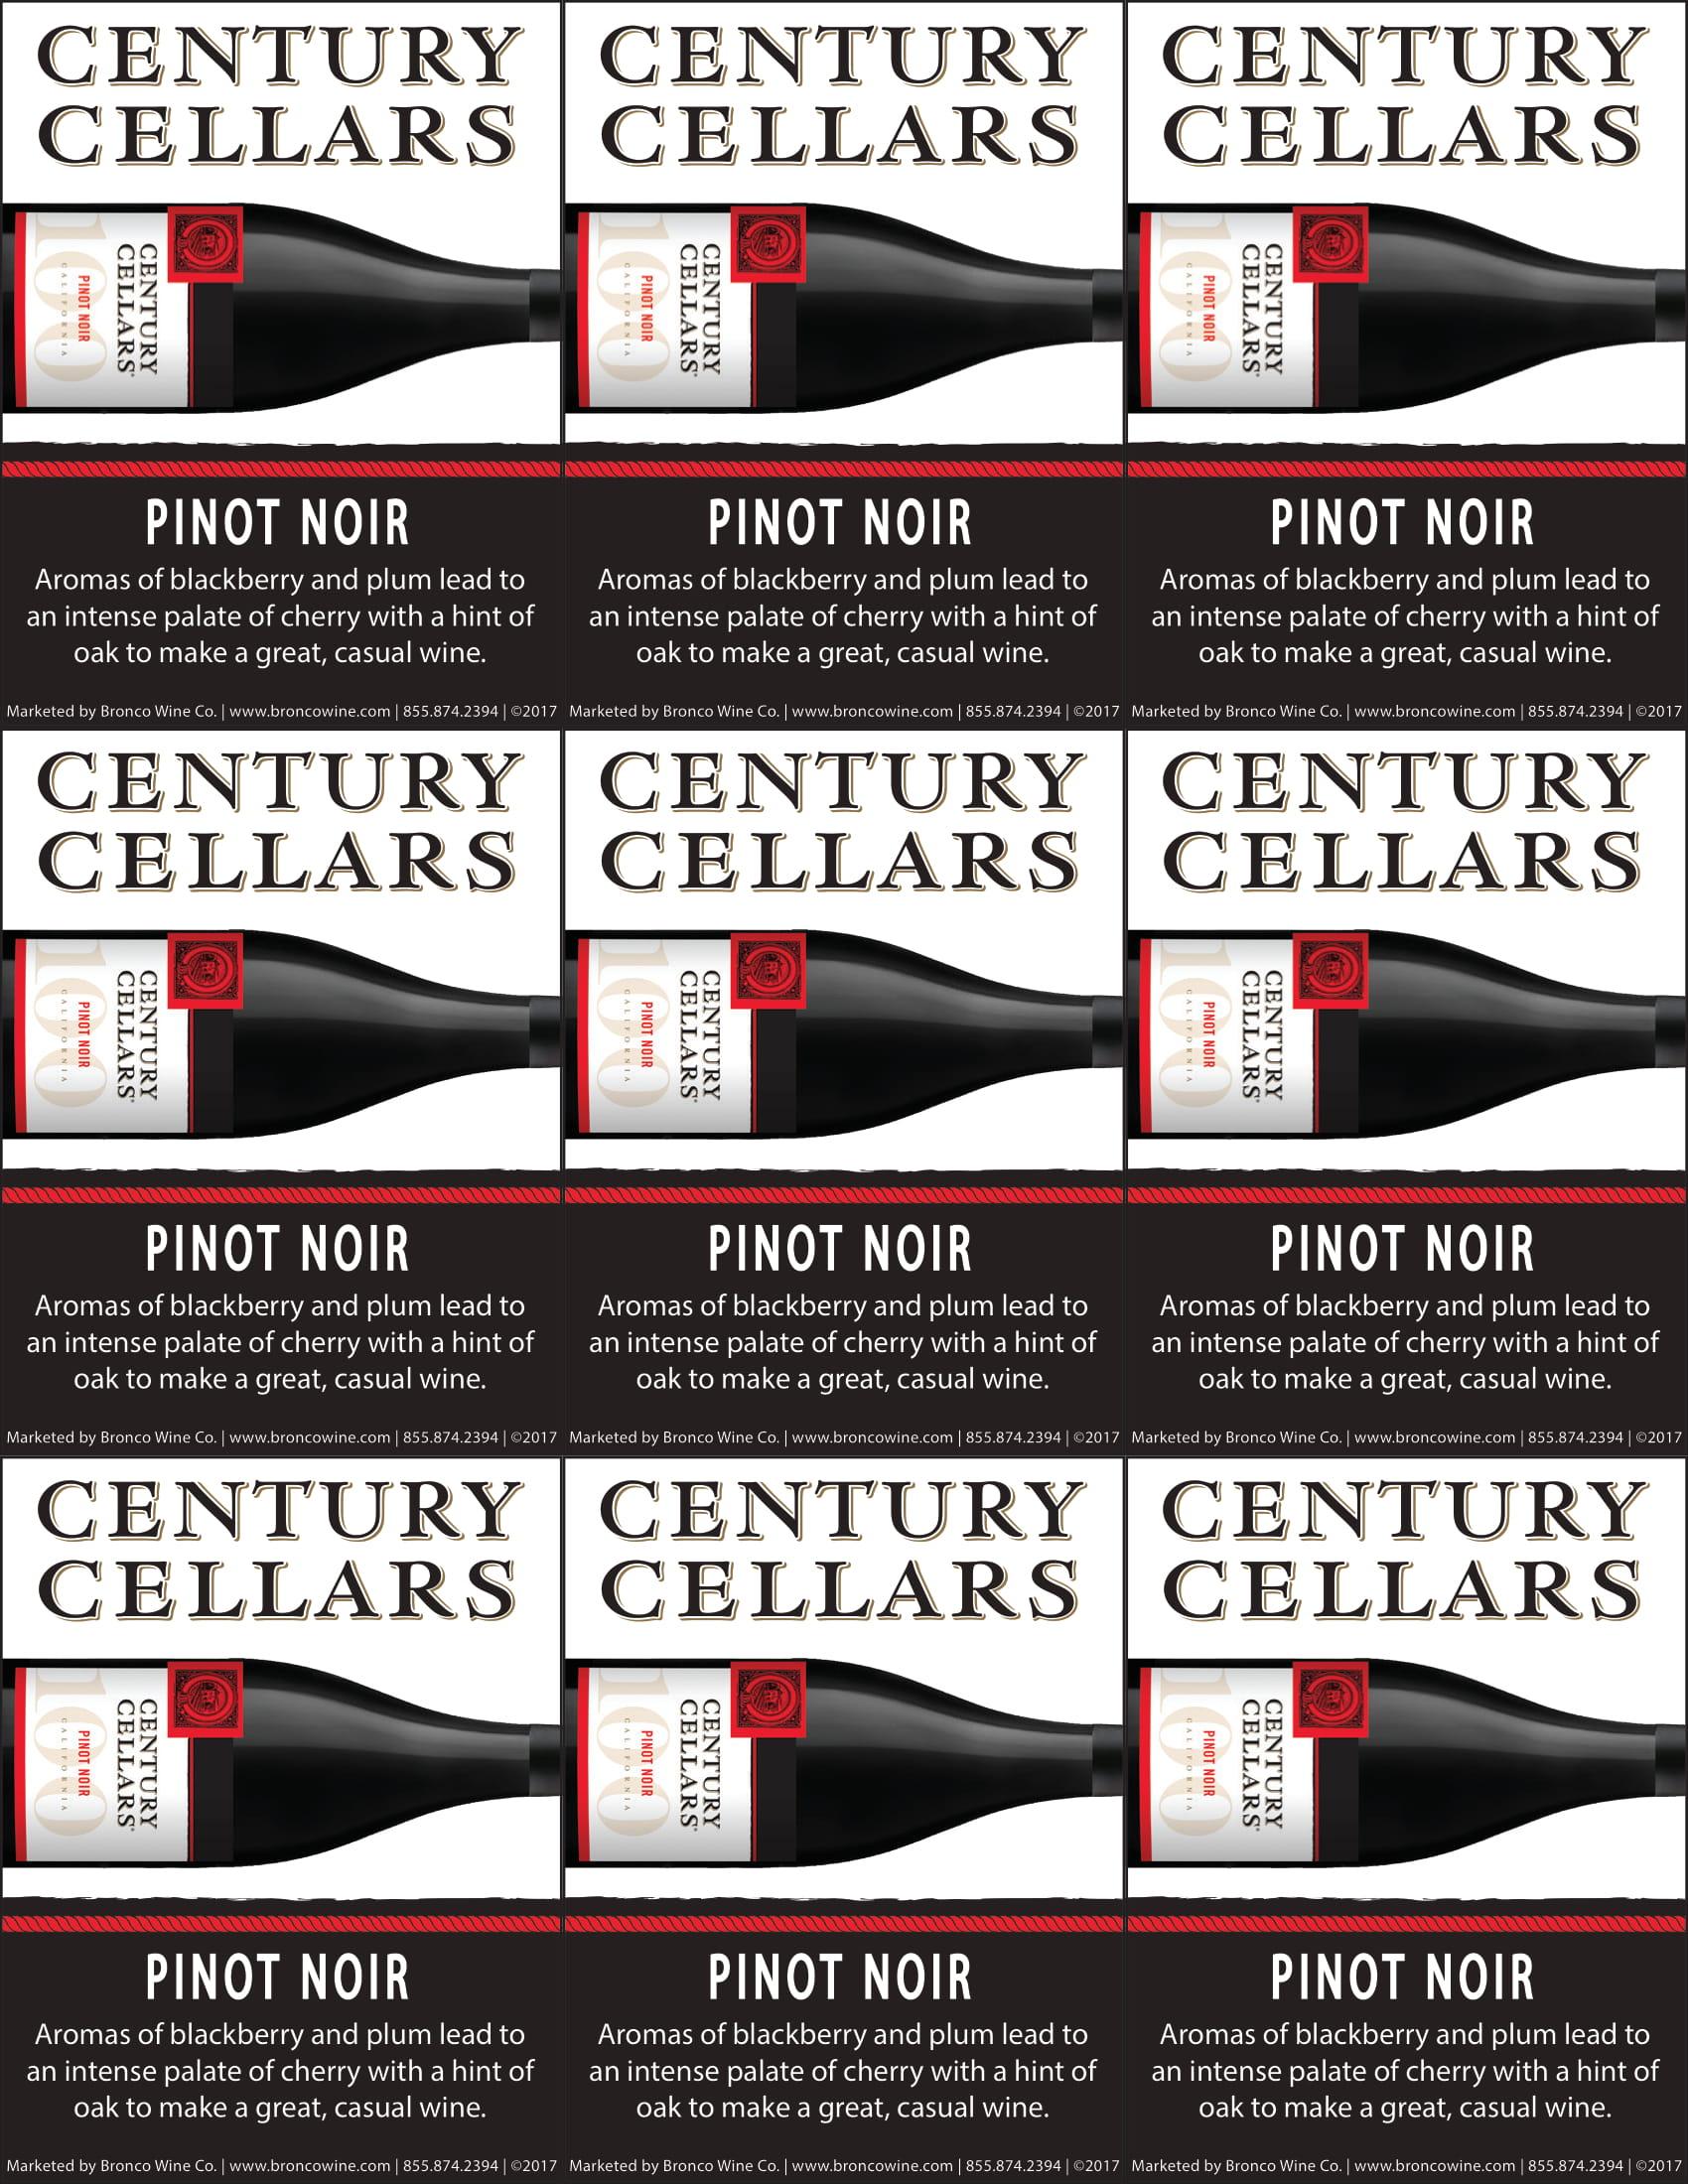 Century Cellars Pinot Noir Shelf Talkers